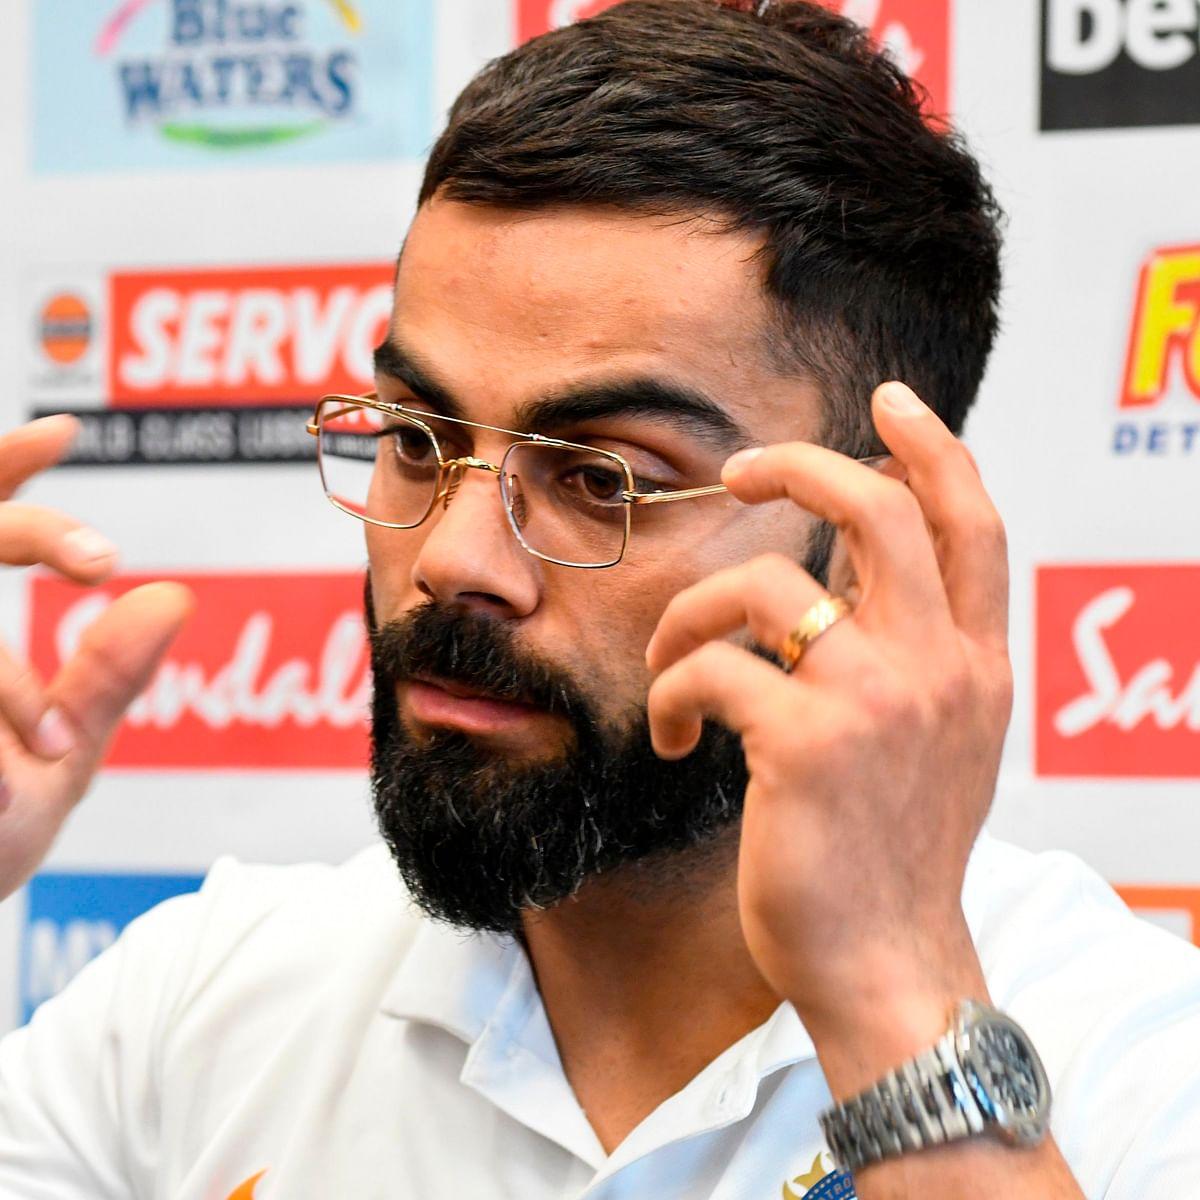 Focus on Virat Kohli's workload; Rishabh Pant, Sanju Samson could be in T20 squad